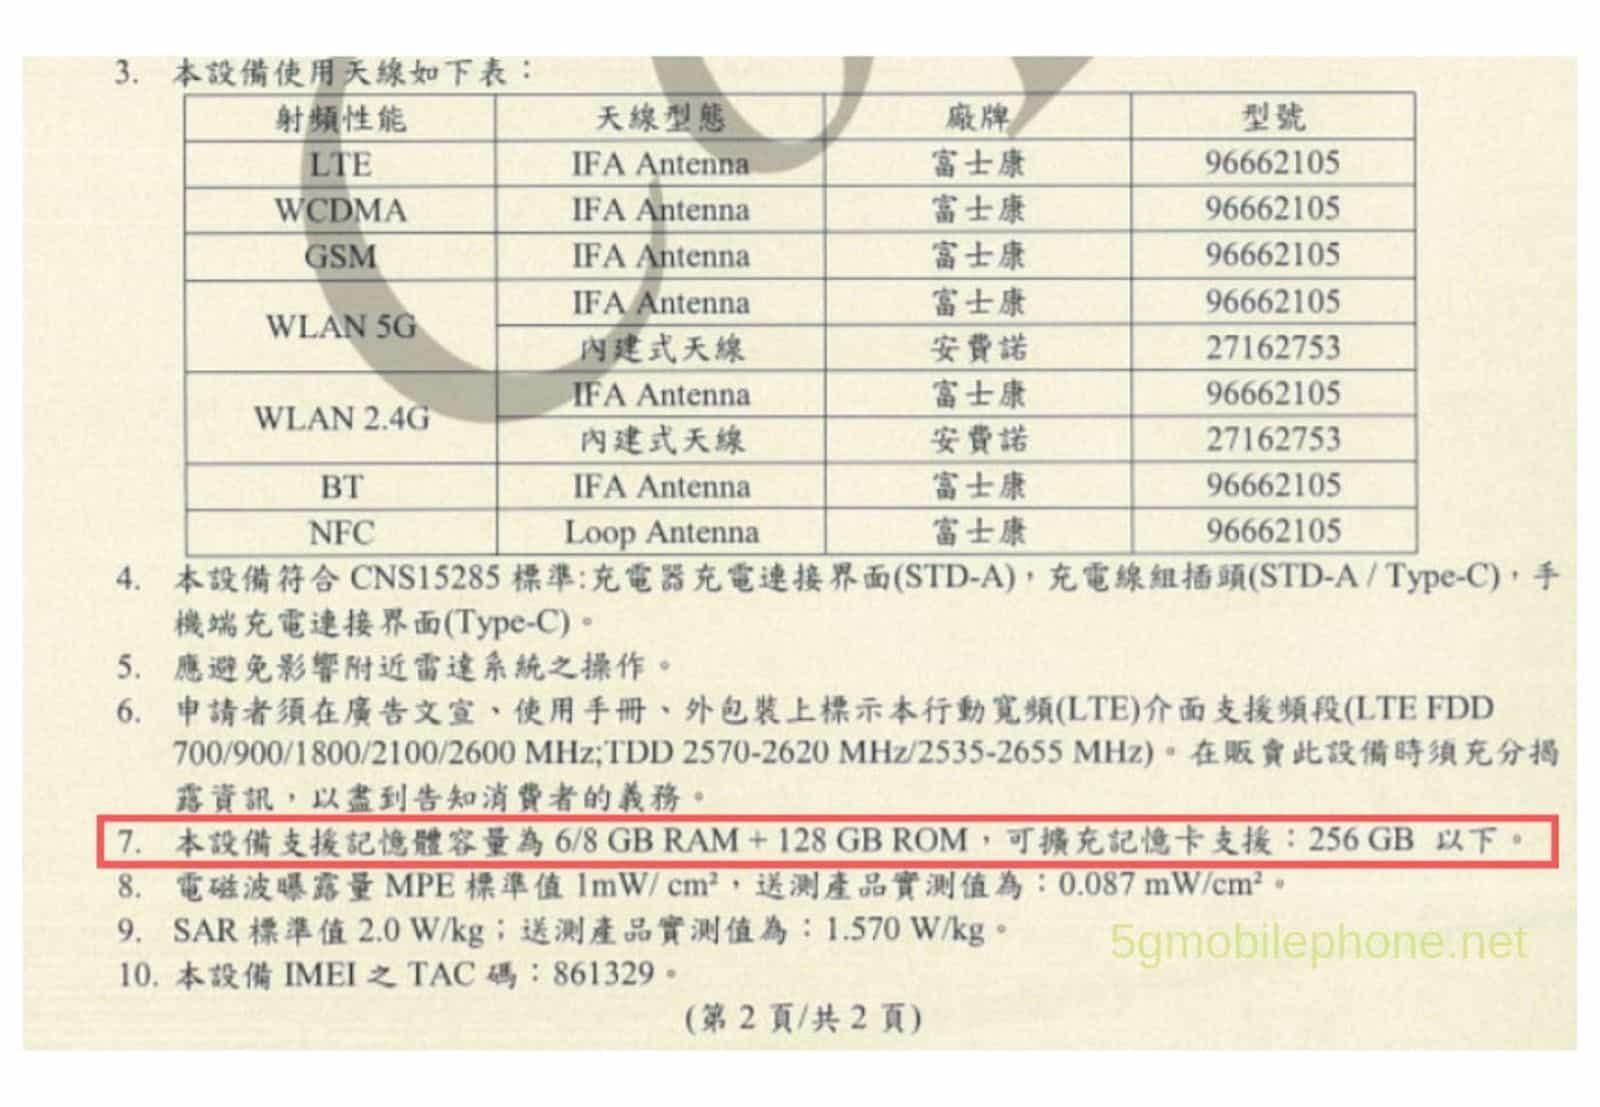 Huawei P30 Series Taiwan Approval 3